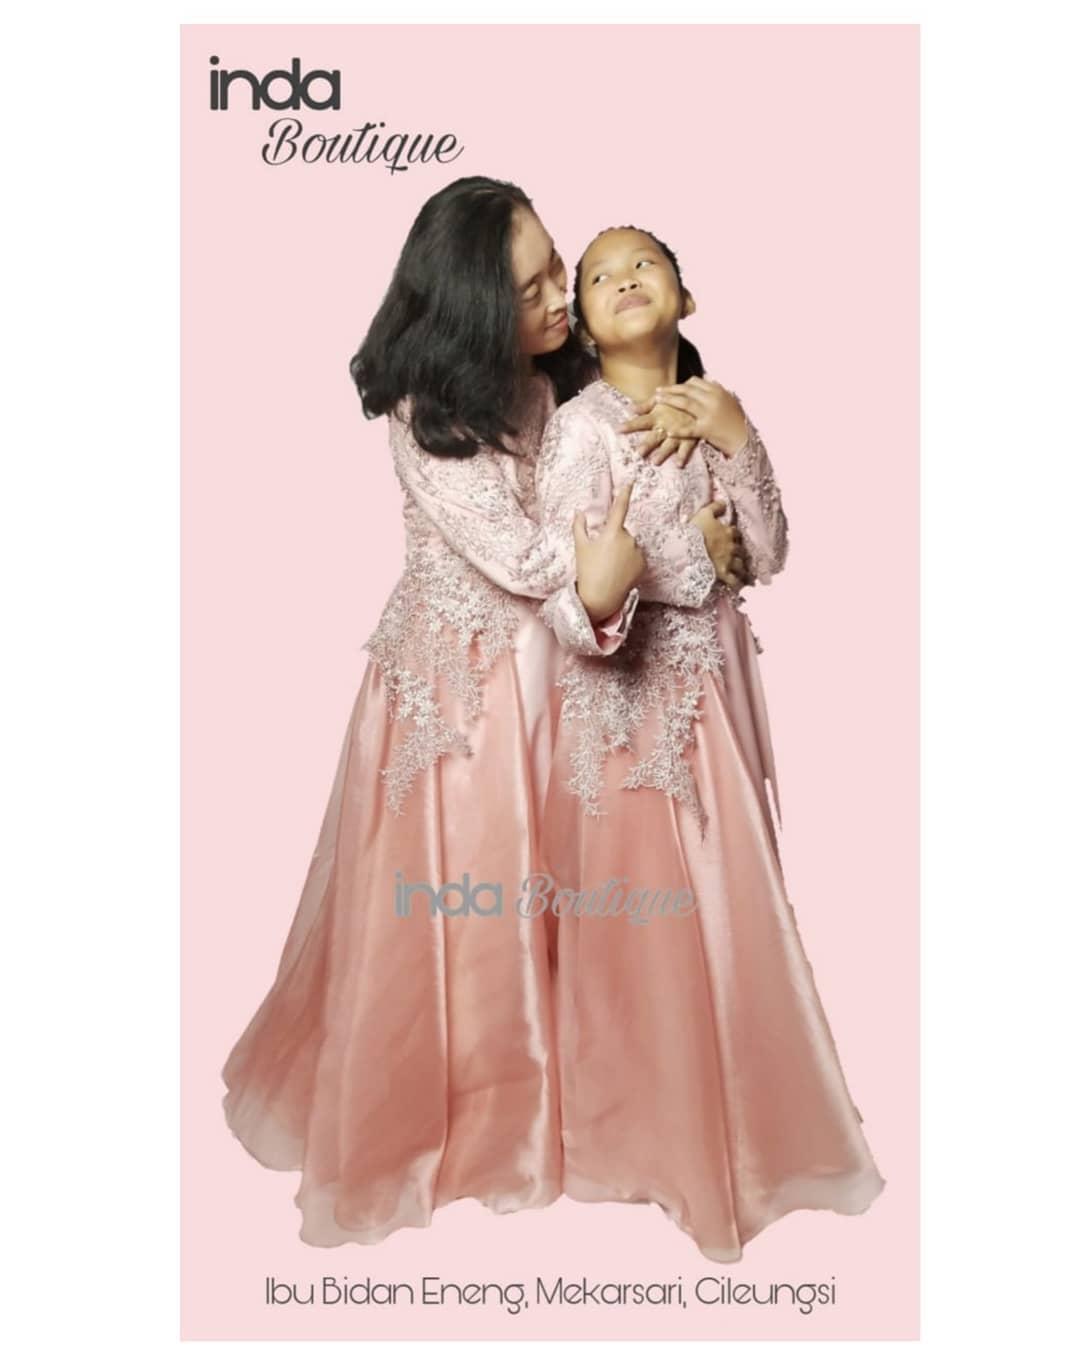 Gaun Cantik untuk Ibu Bidan Eneng dan Putrinya di Mekarsari – Cileungsi